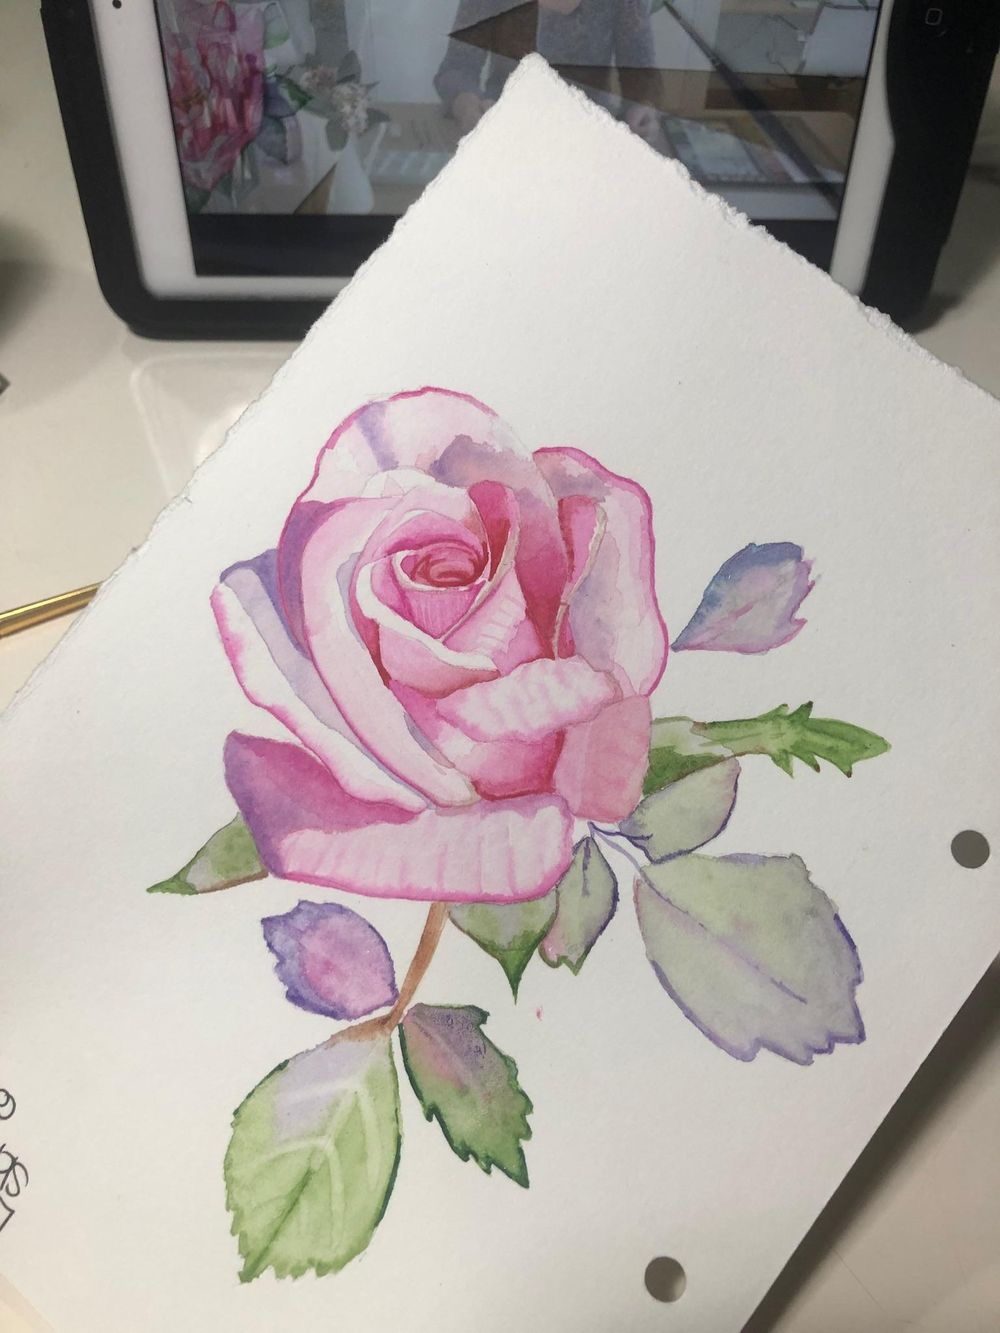 Opera rose - image 1 - student project